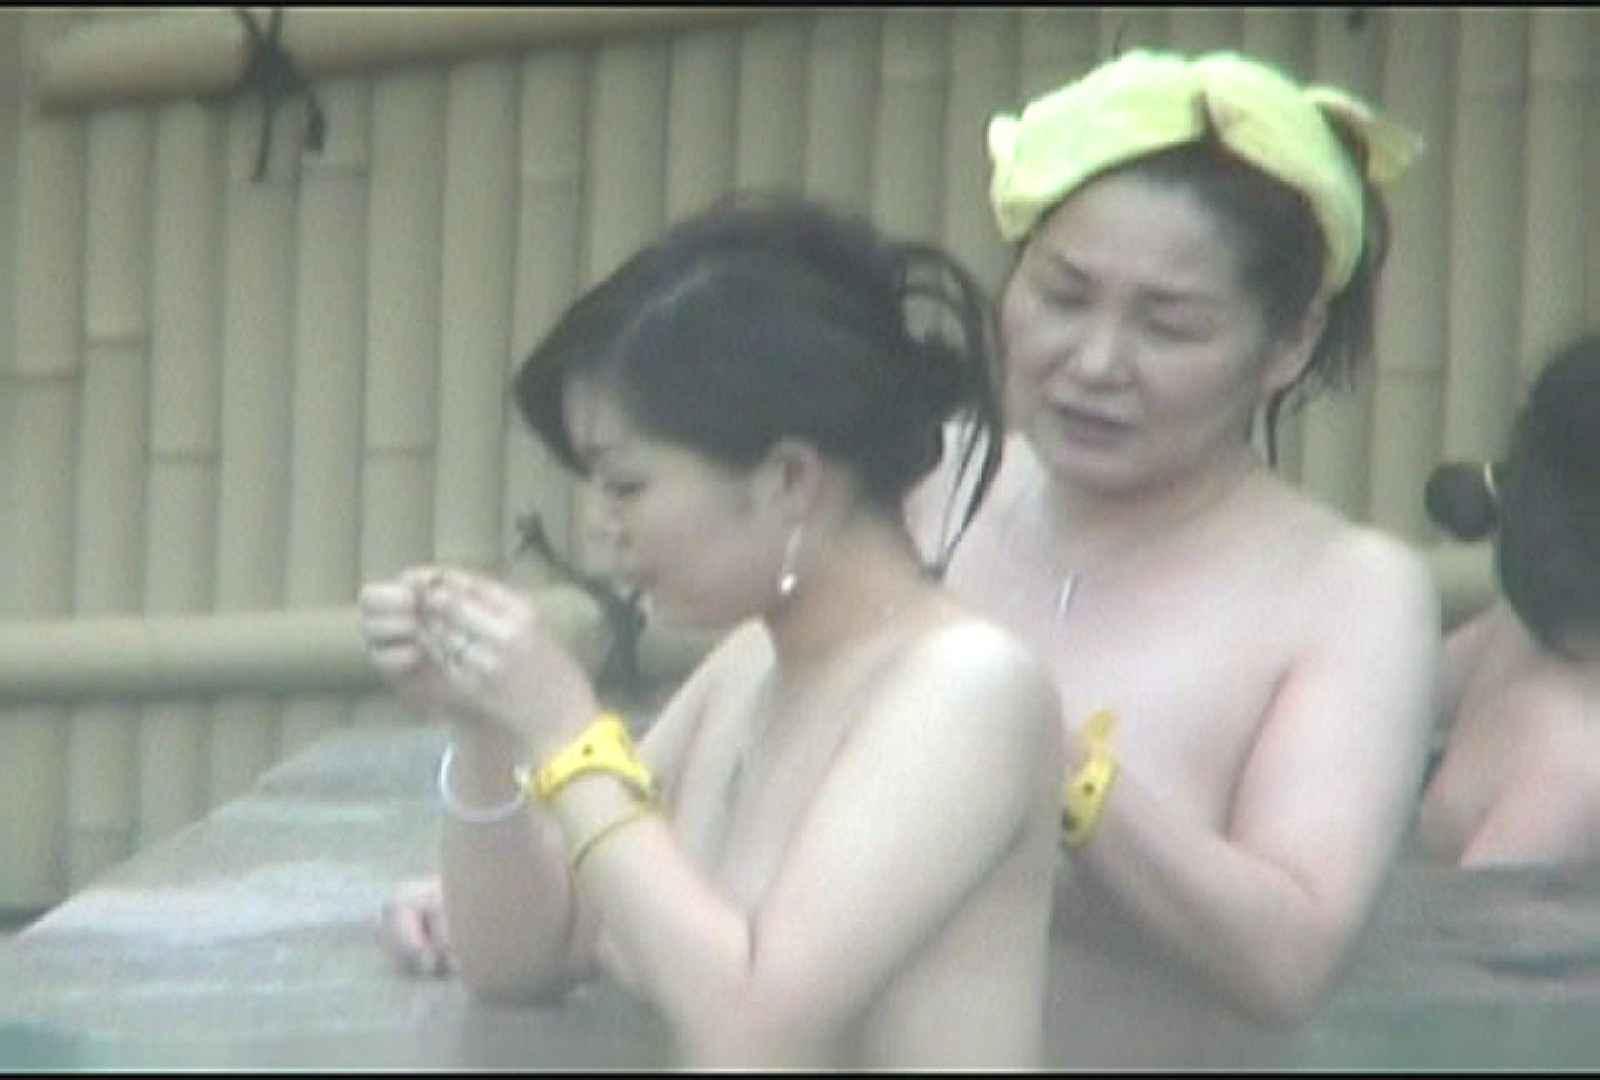 Aquaな露天風呂Vol.145 盗撮映像  78Pix 43